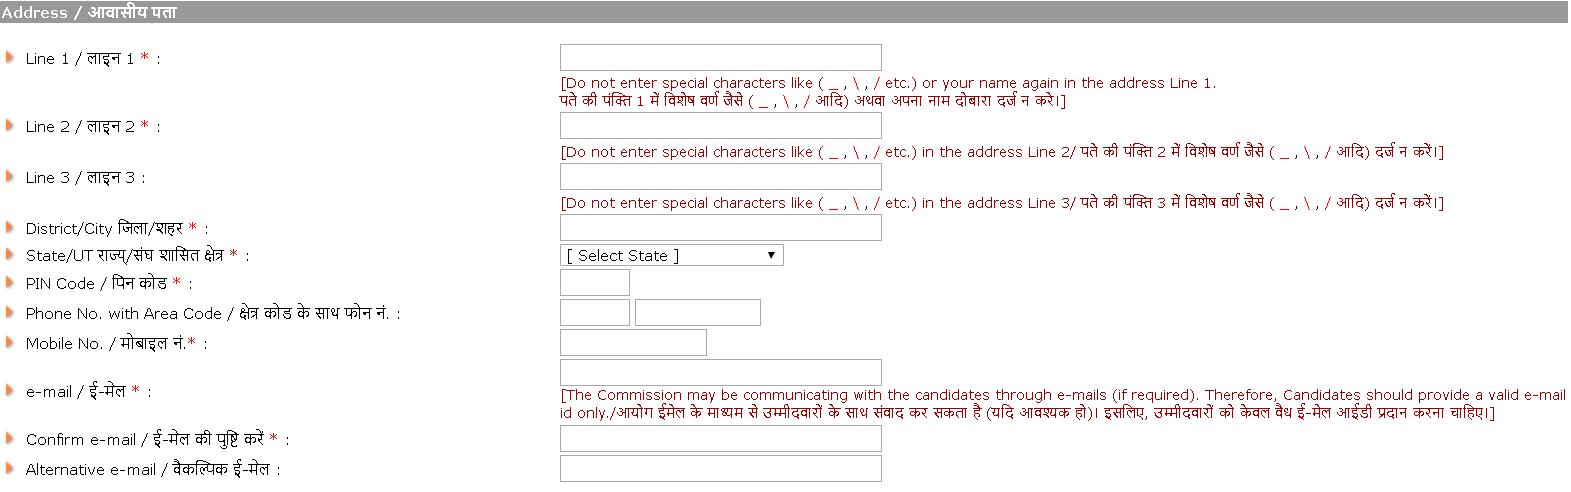 NDA Application Form Address Details